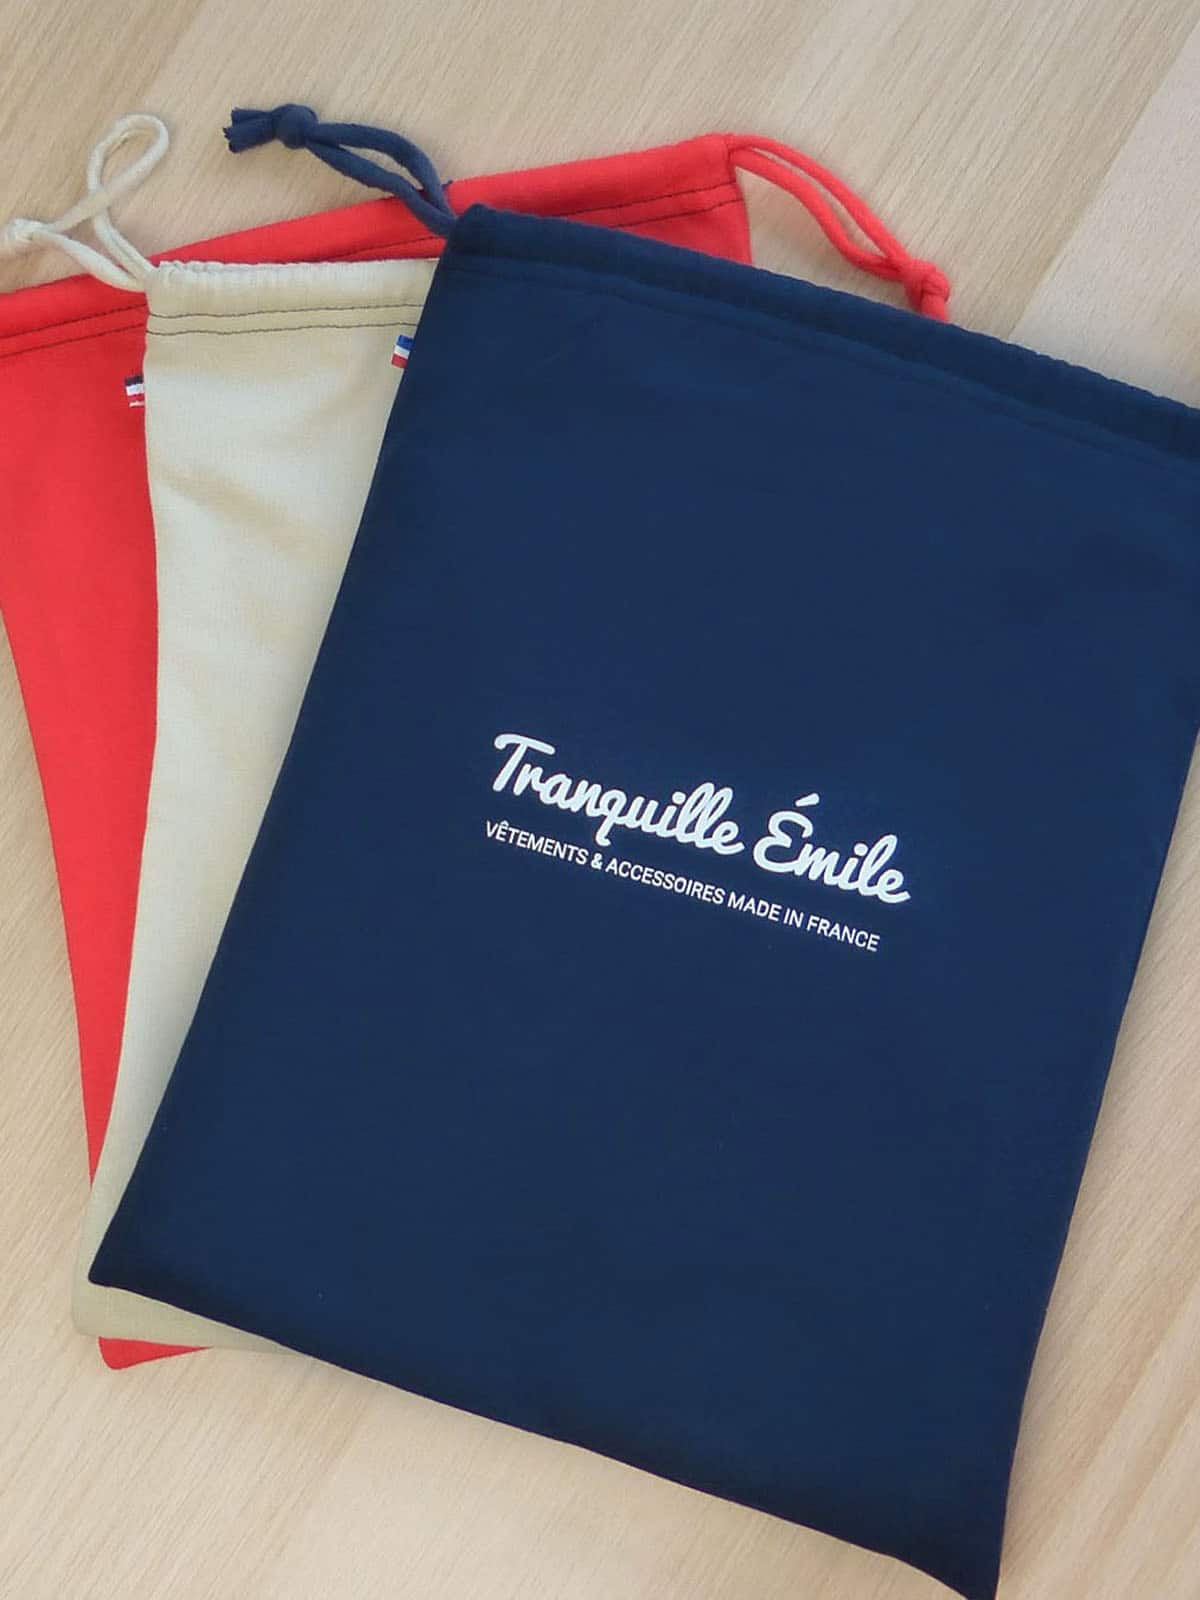 pochon-cadeau-made-in-france-tranquille-emile